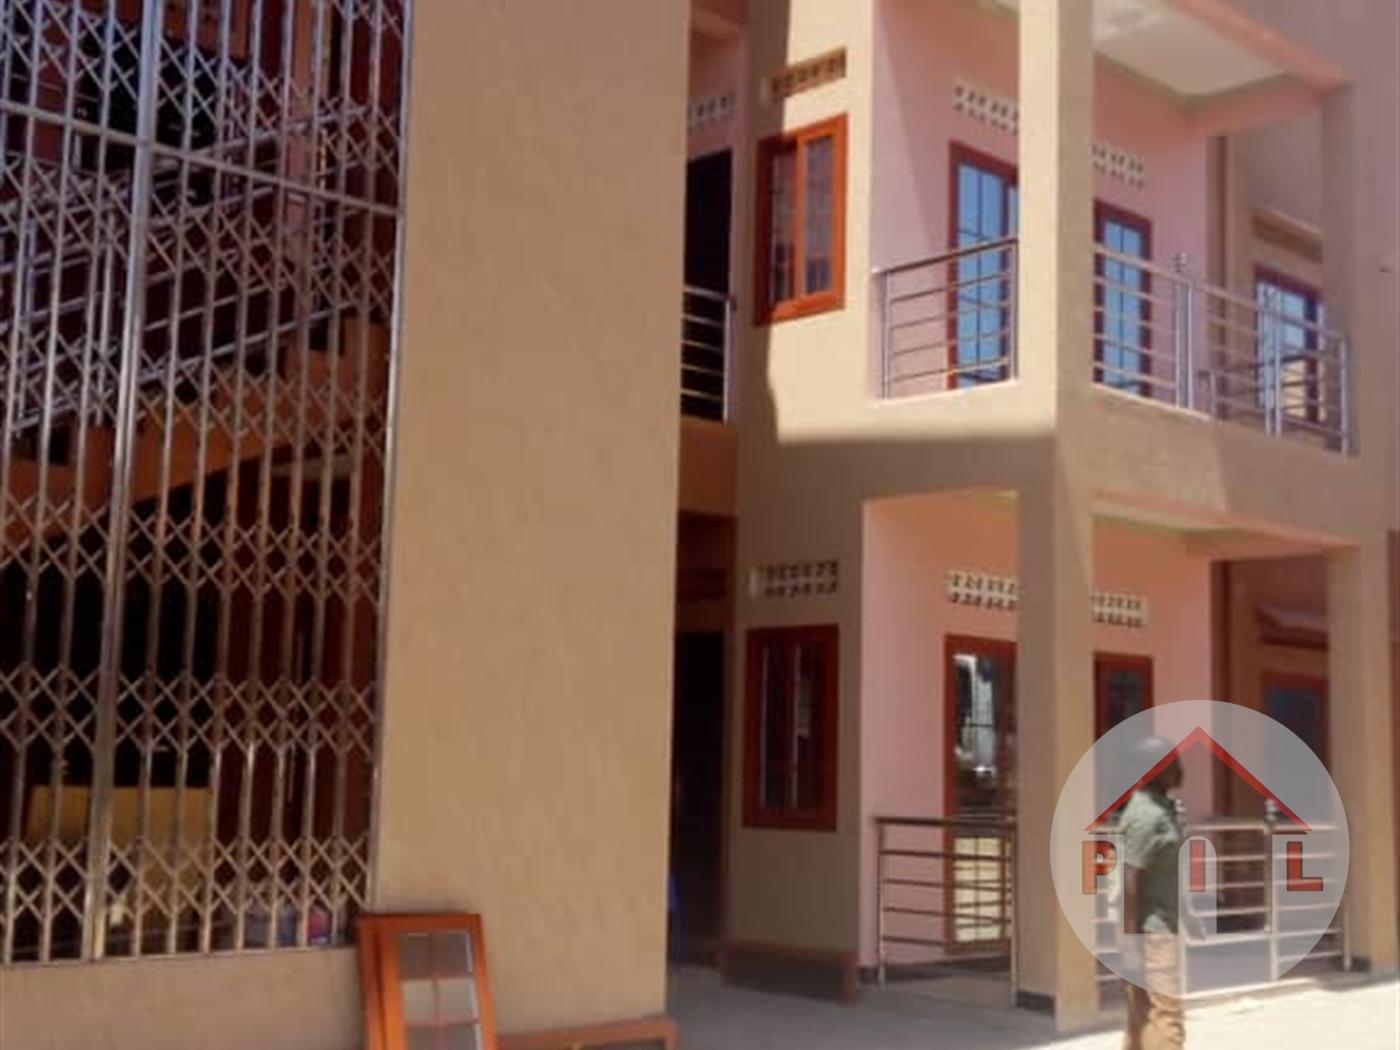 Apartment block for sale in Bulange Kampala